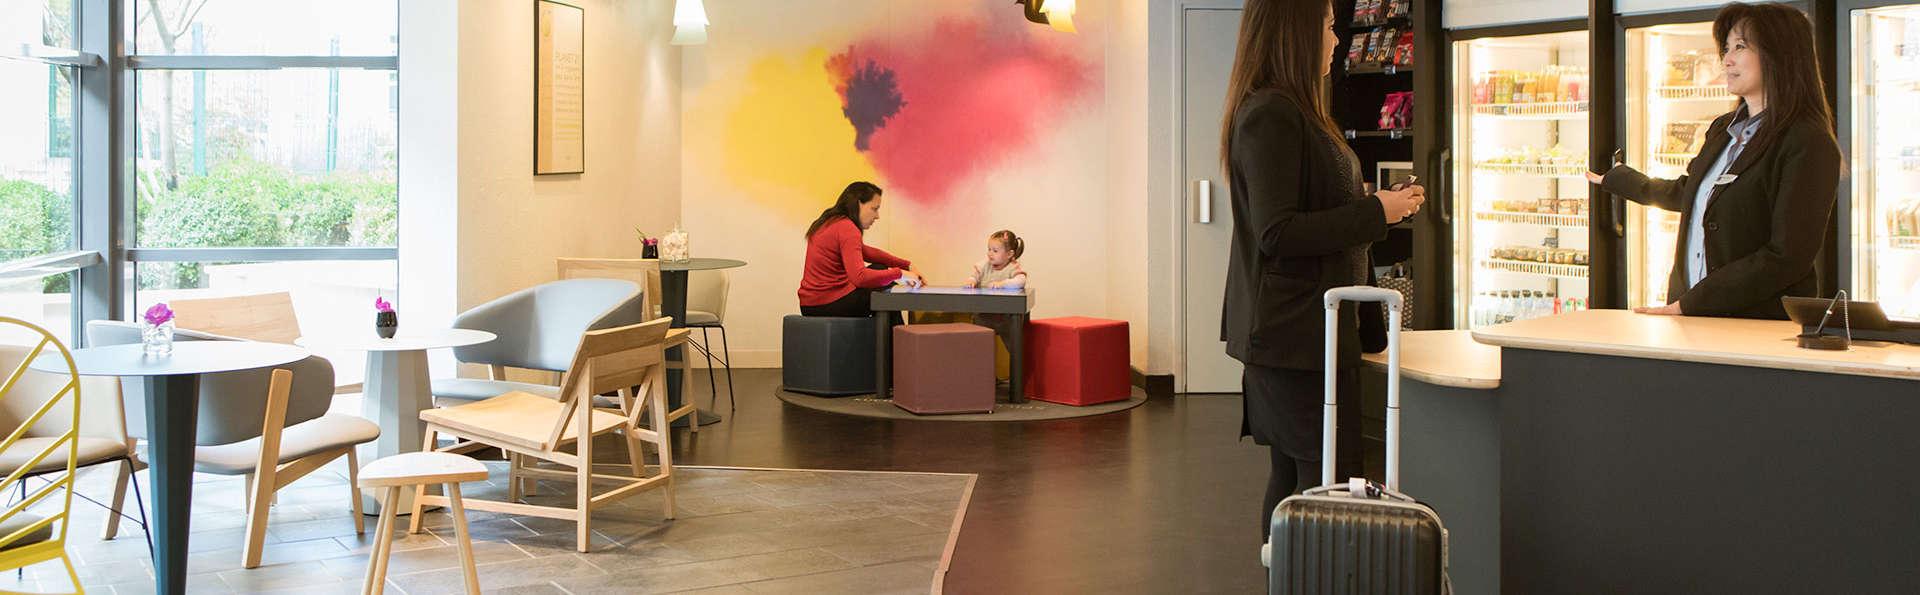 Novotel Suites Paris Rueil Malmaison - edit_lobby7.jpg